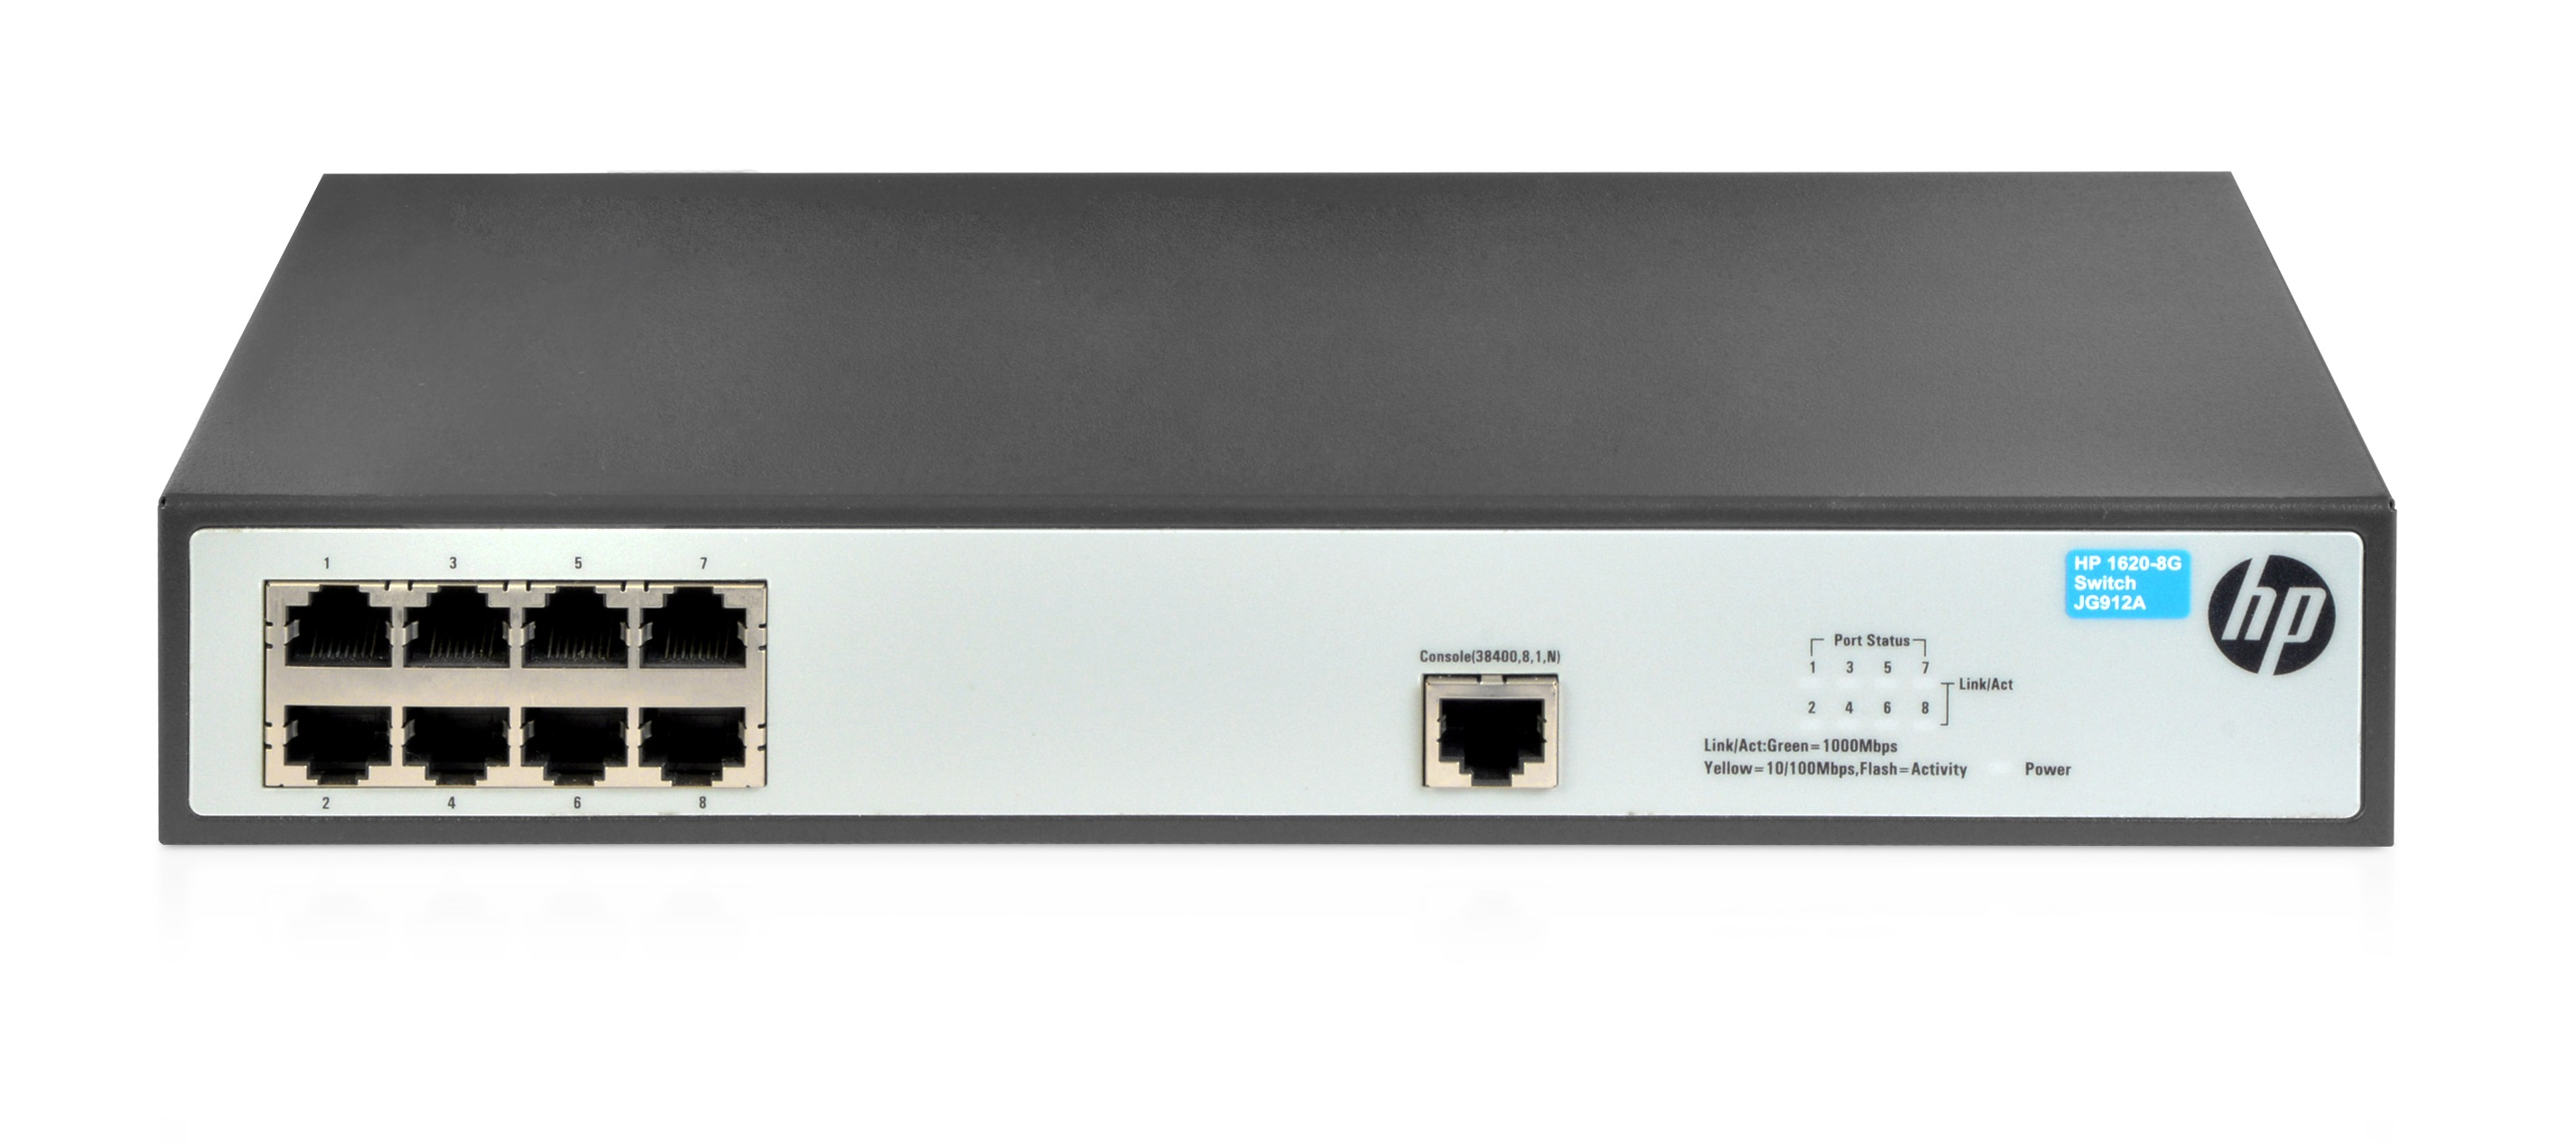 HPE 1620 8G Switch